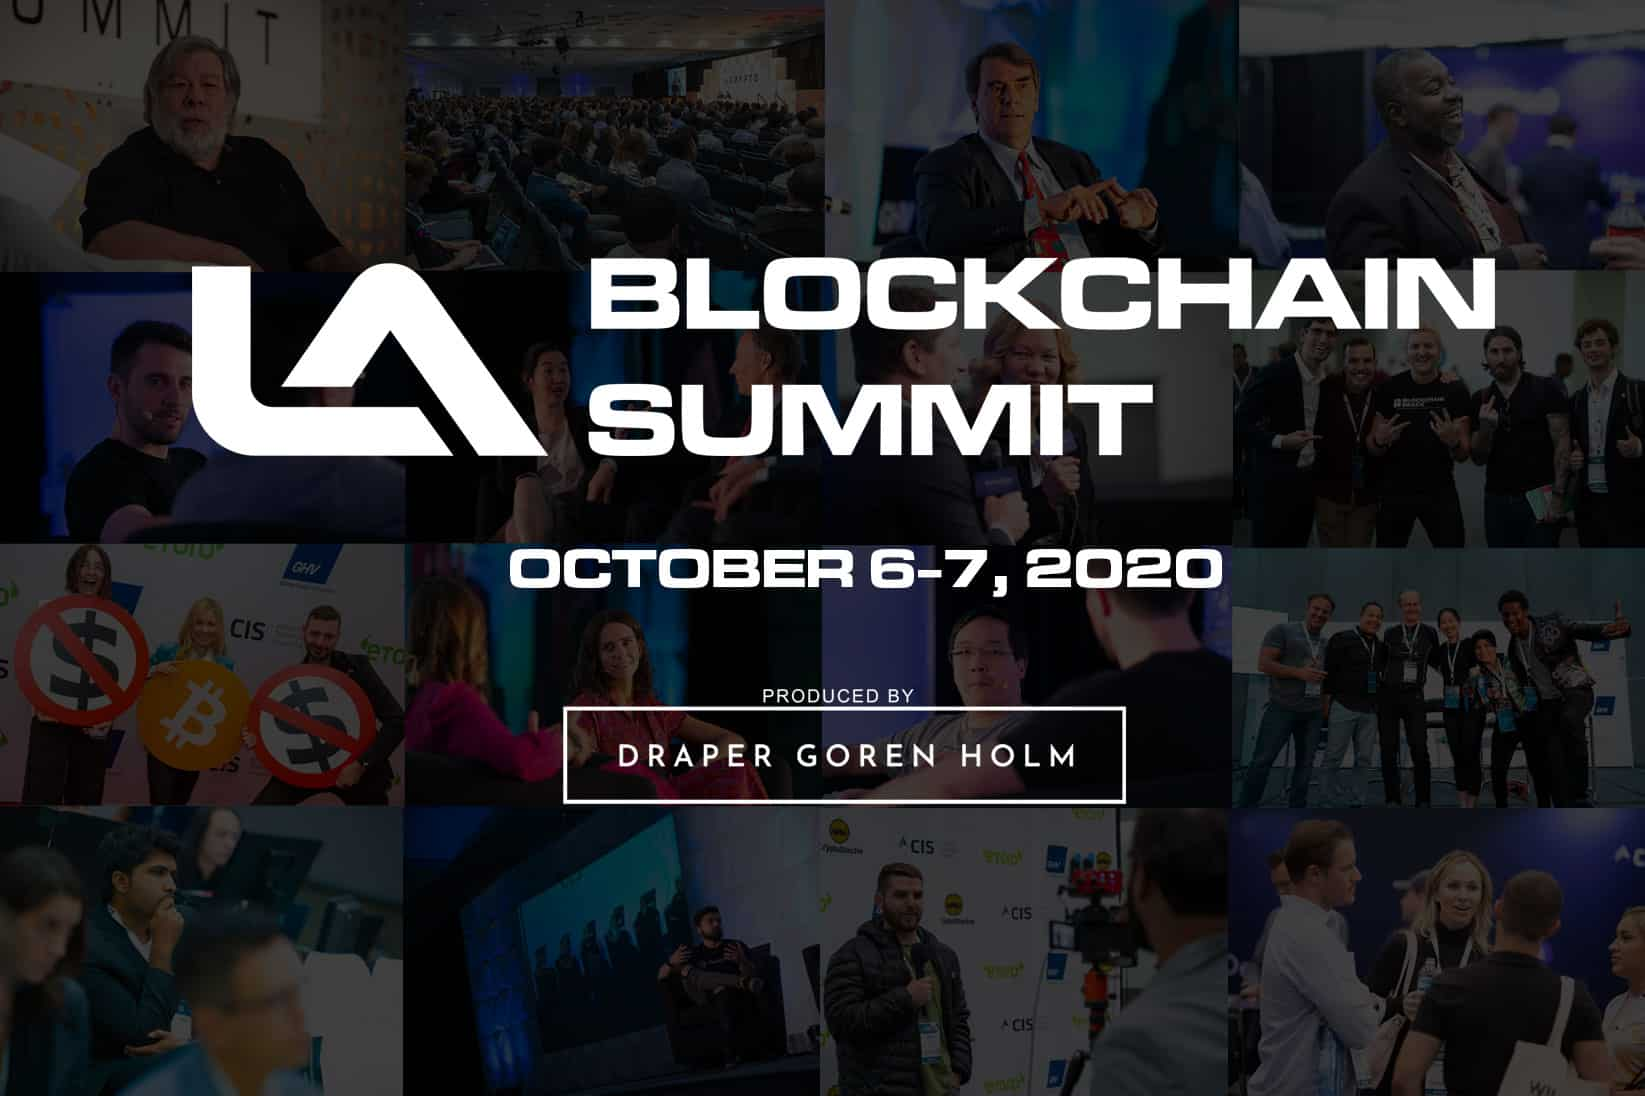 LA Blockchain Summit Offers